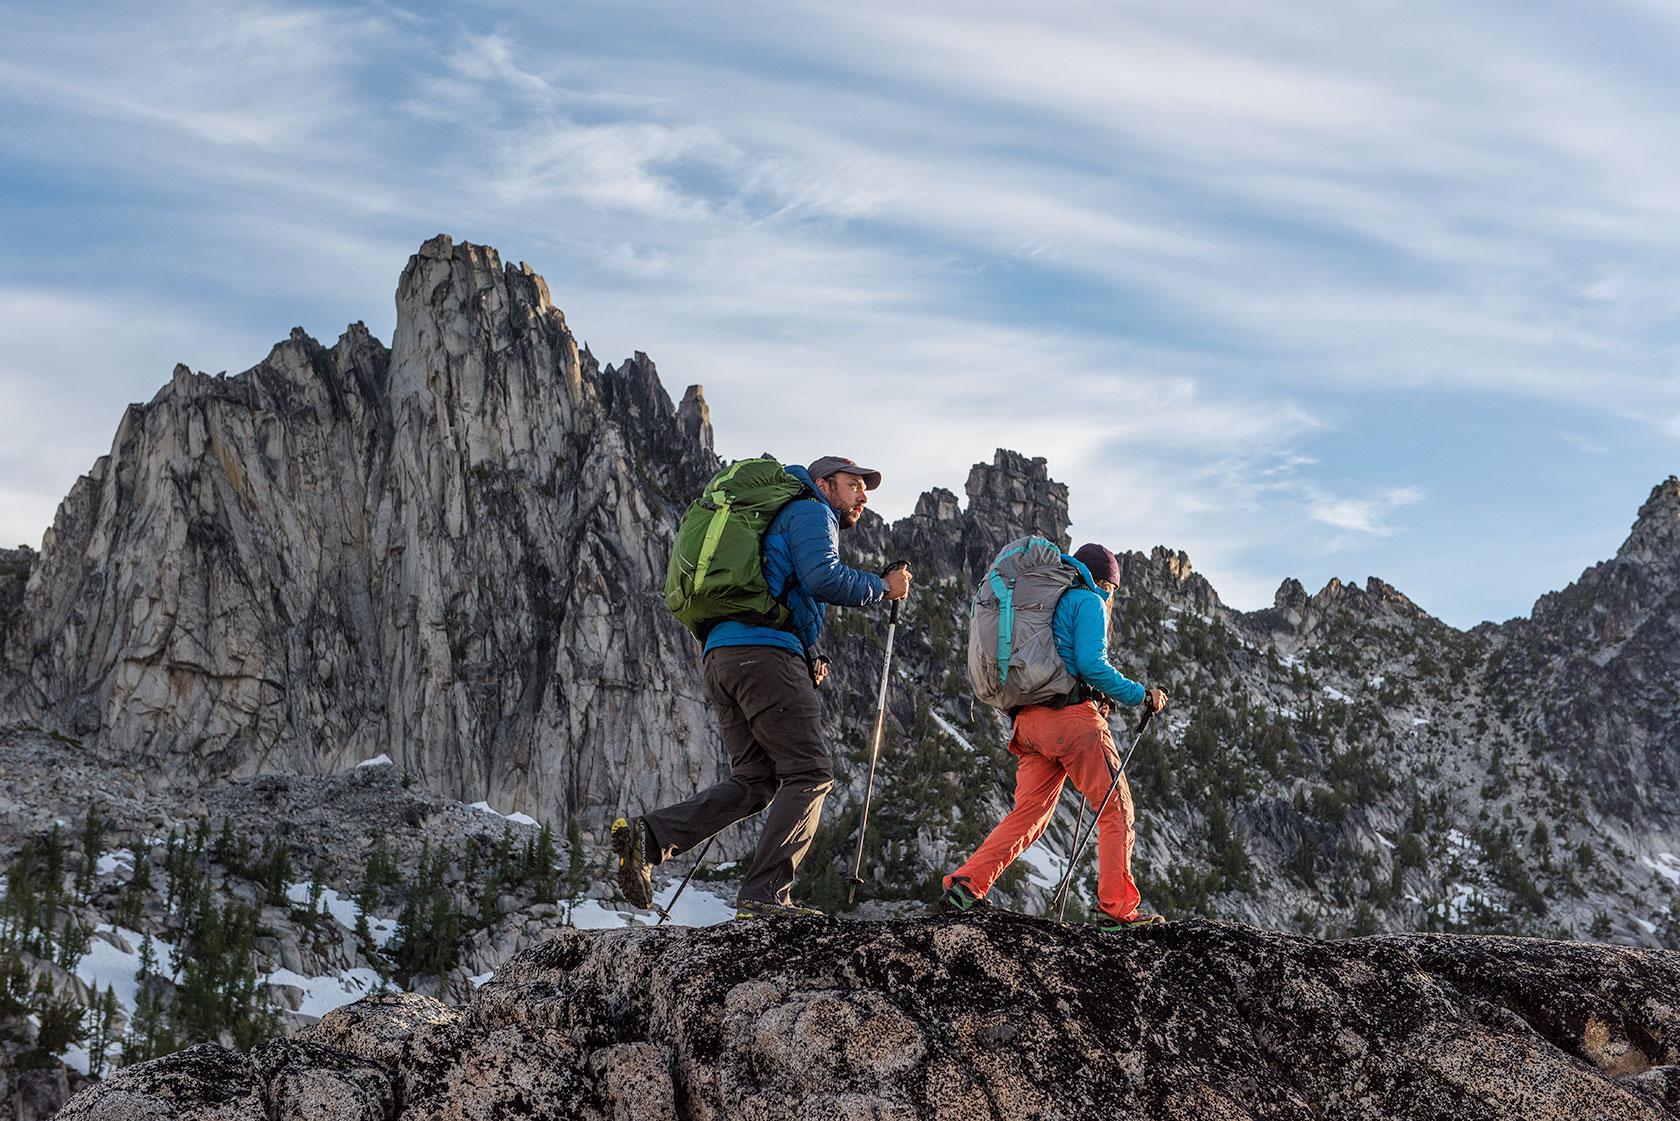 austin-trigg-osprey-hiking-backpacks-washington-lifestyle-morning-adventure-outdoor-active-hike-camp-sunrise-enchantments-adventure-prusik-mountain-range.jpg